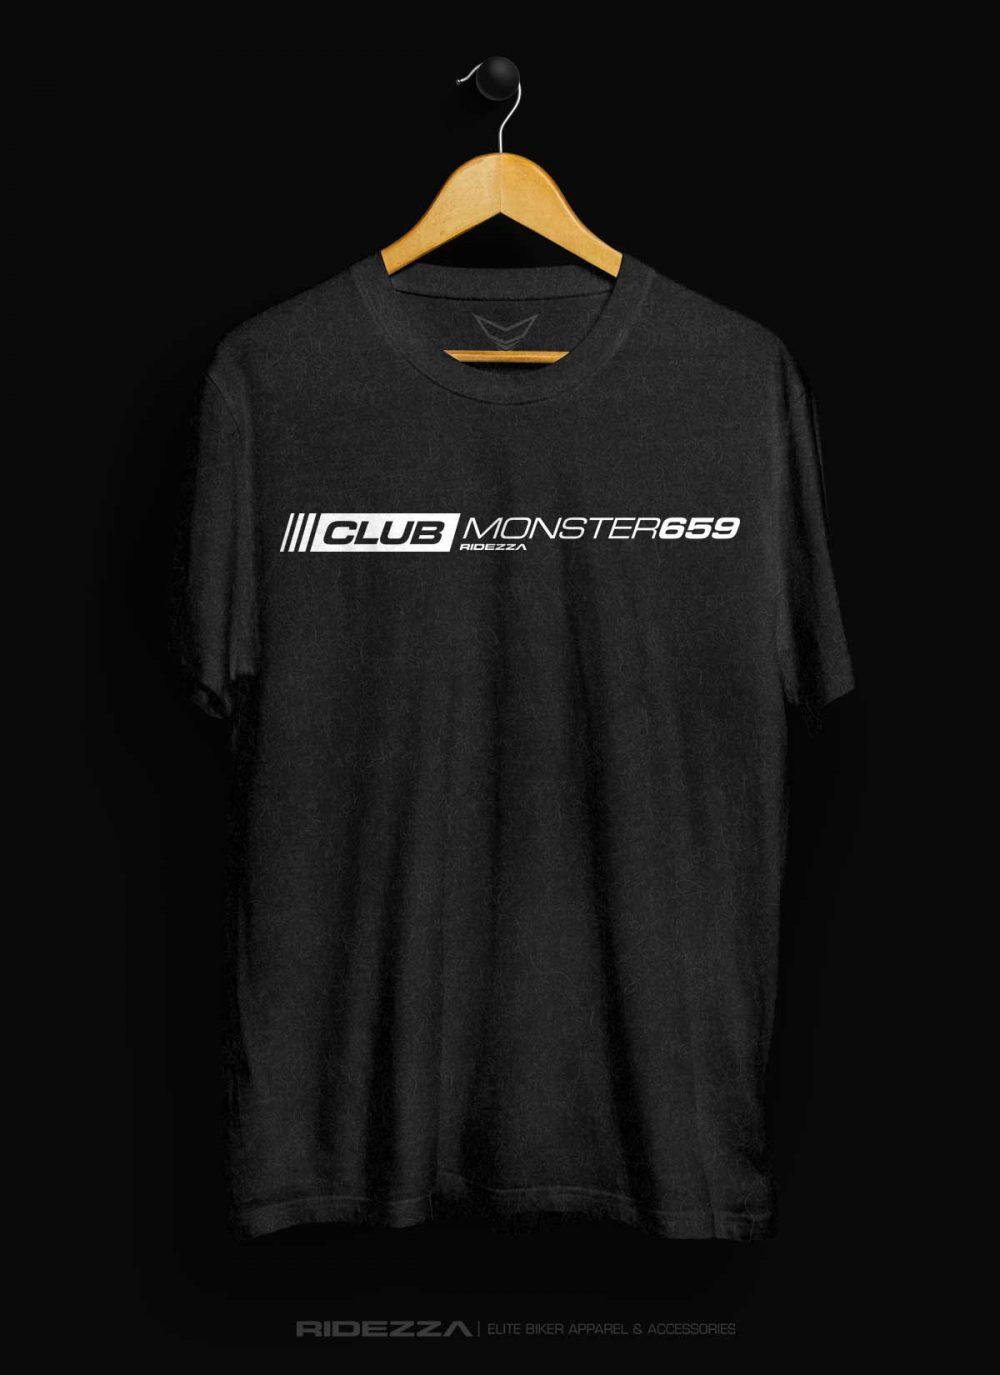 Ducati Monster 659 Club T-Shirt